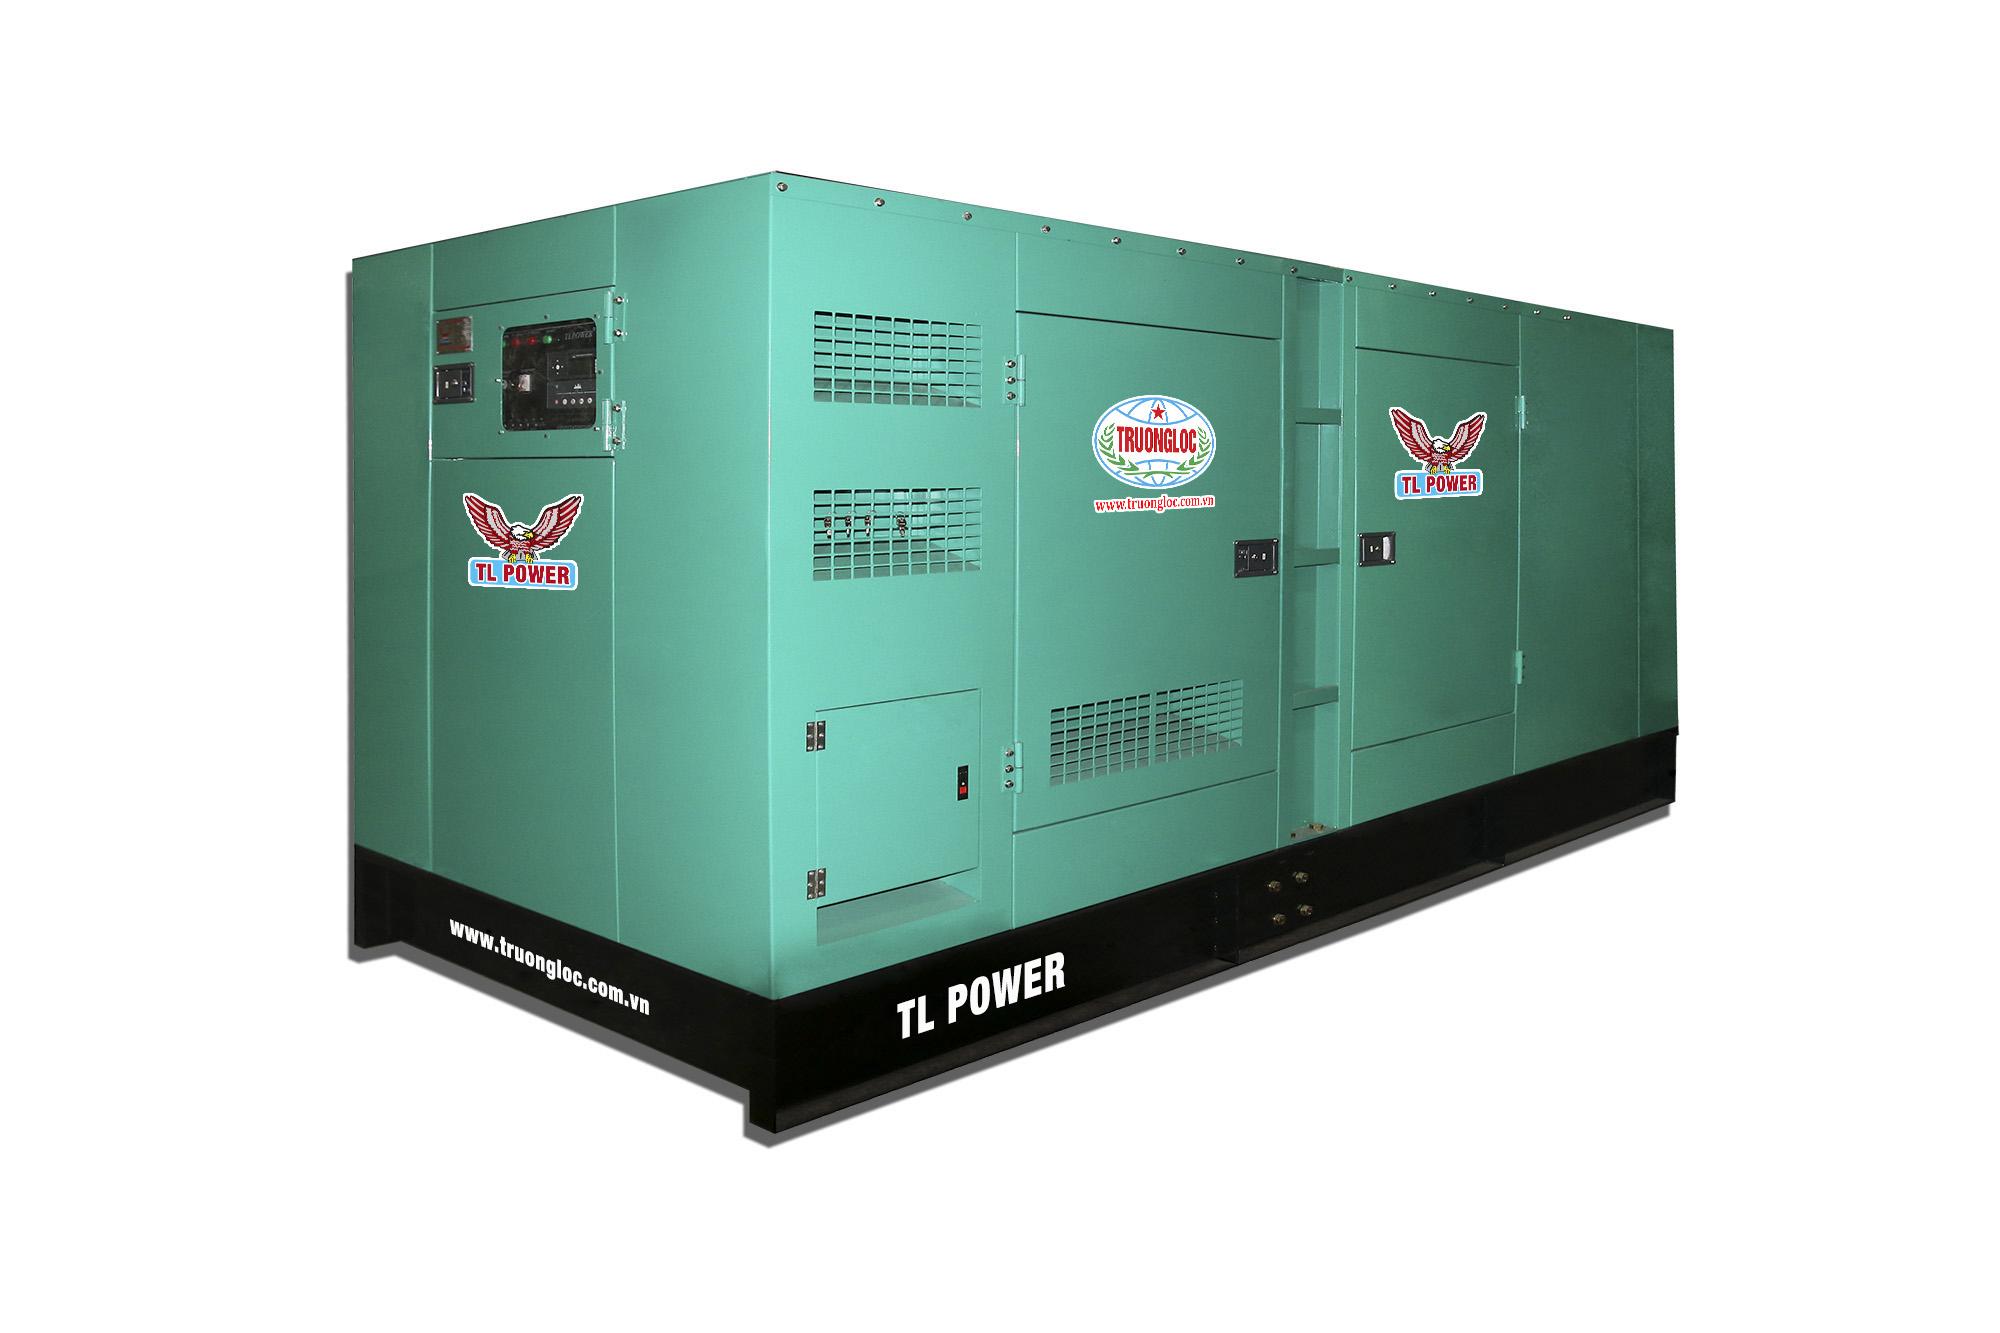 TLPOWER TP110-LS - PERKINS ENGINE